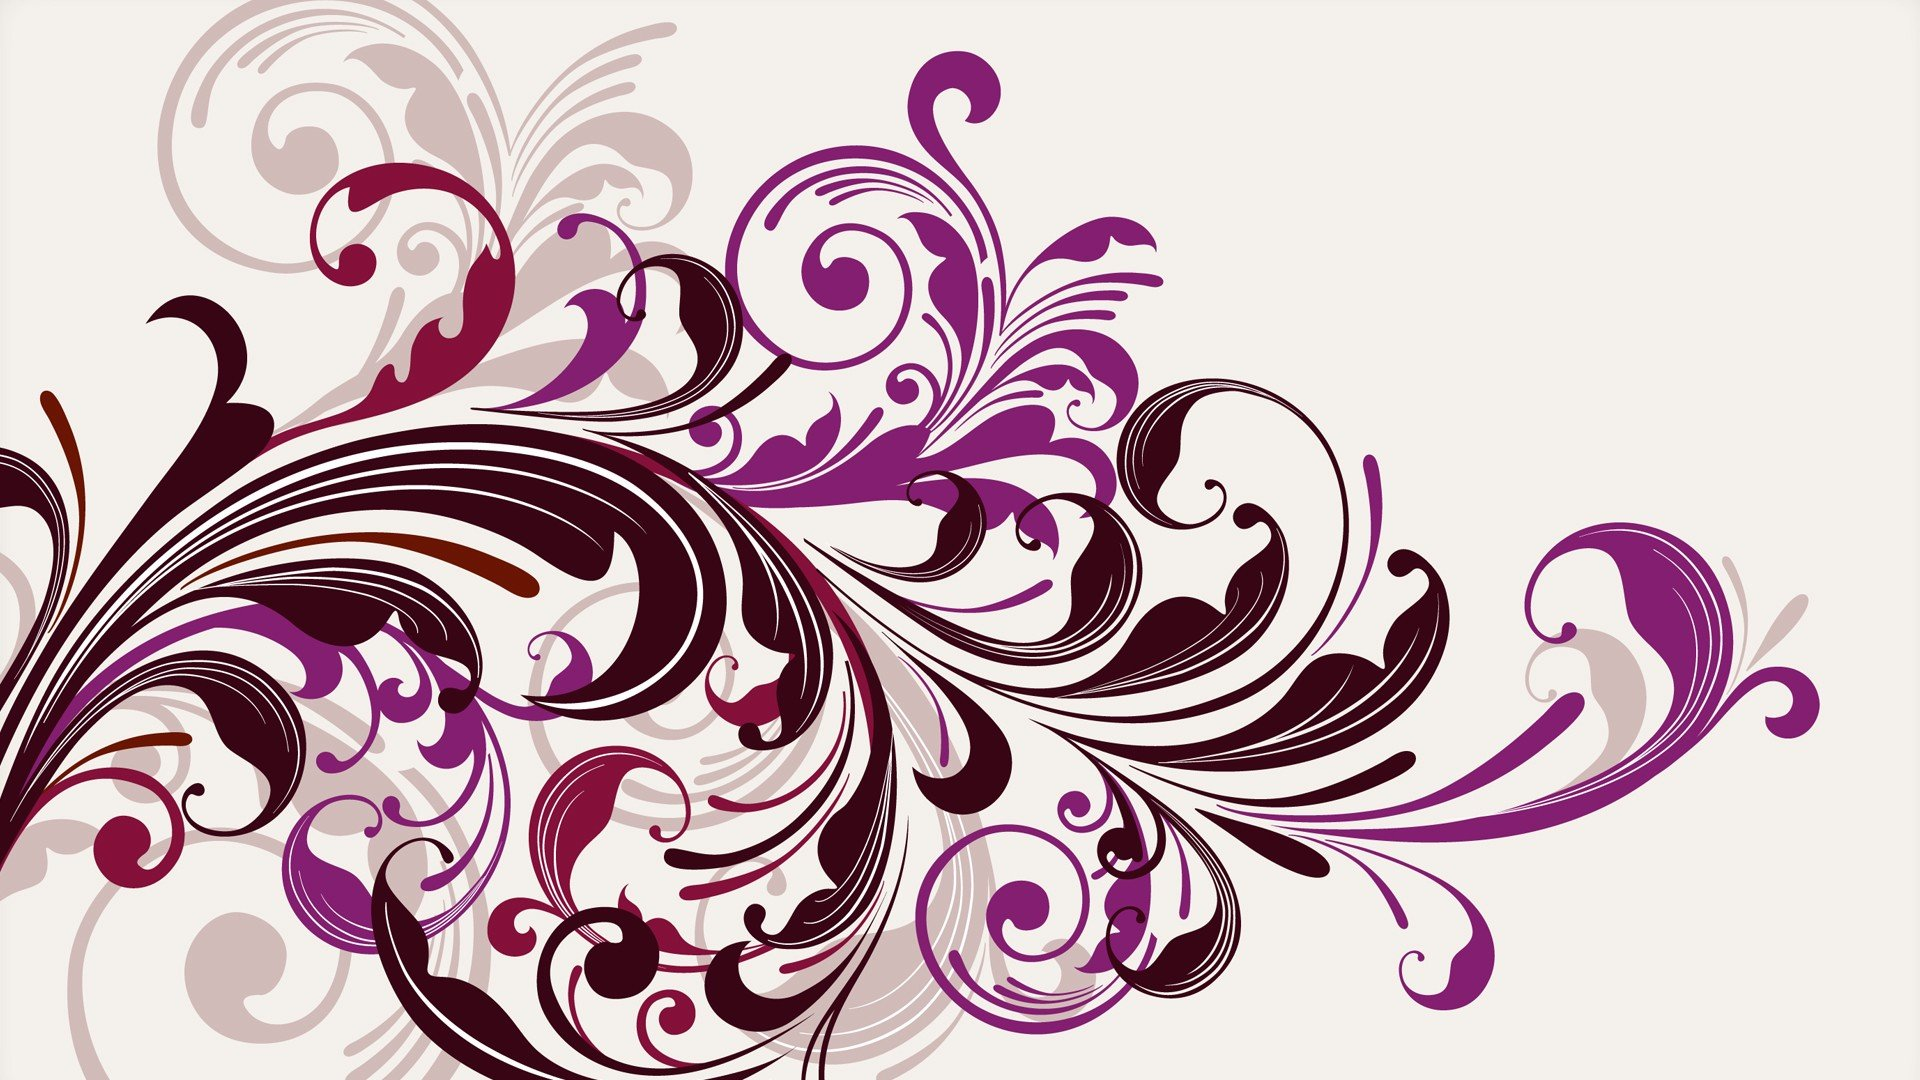 White Swirls Wallpaper Graphics White Background